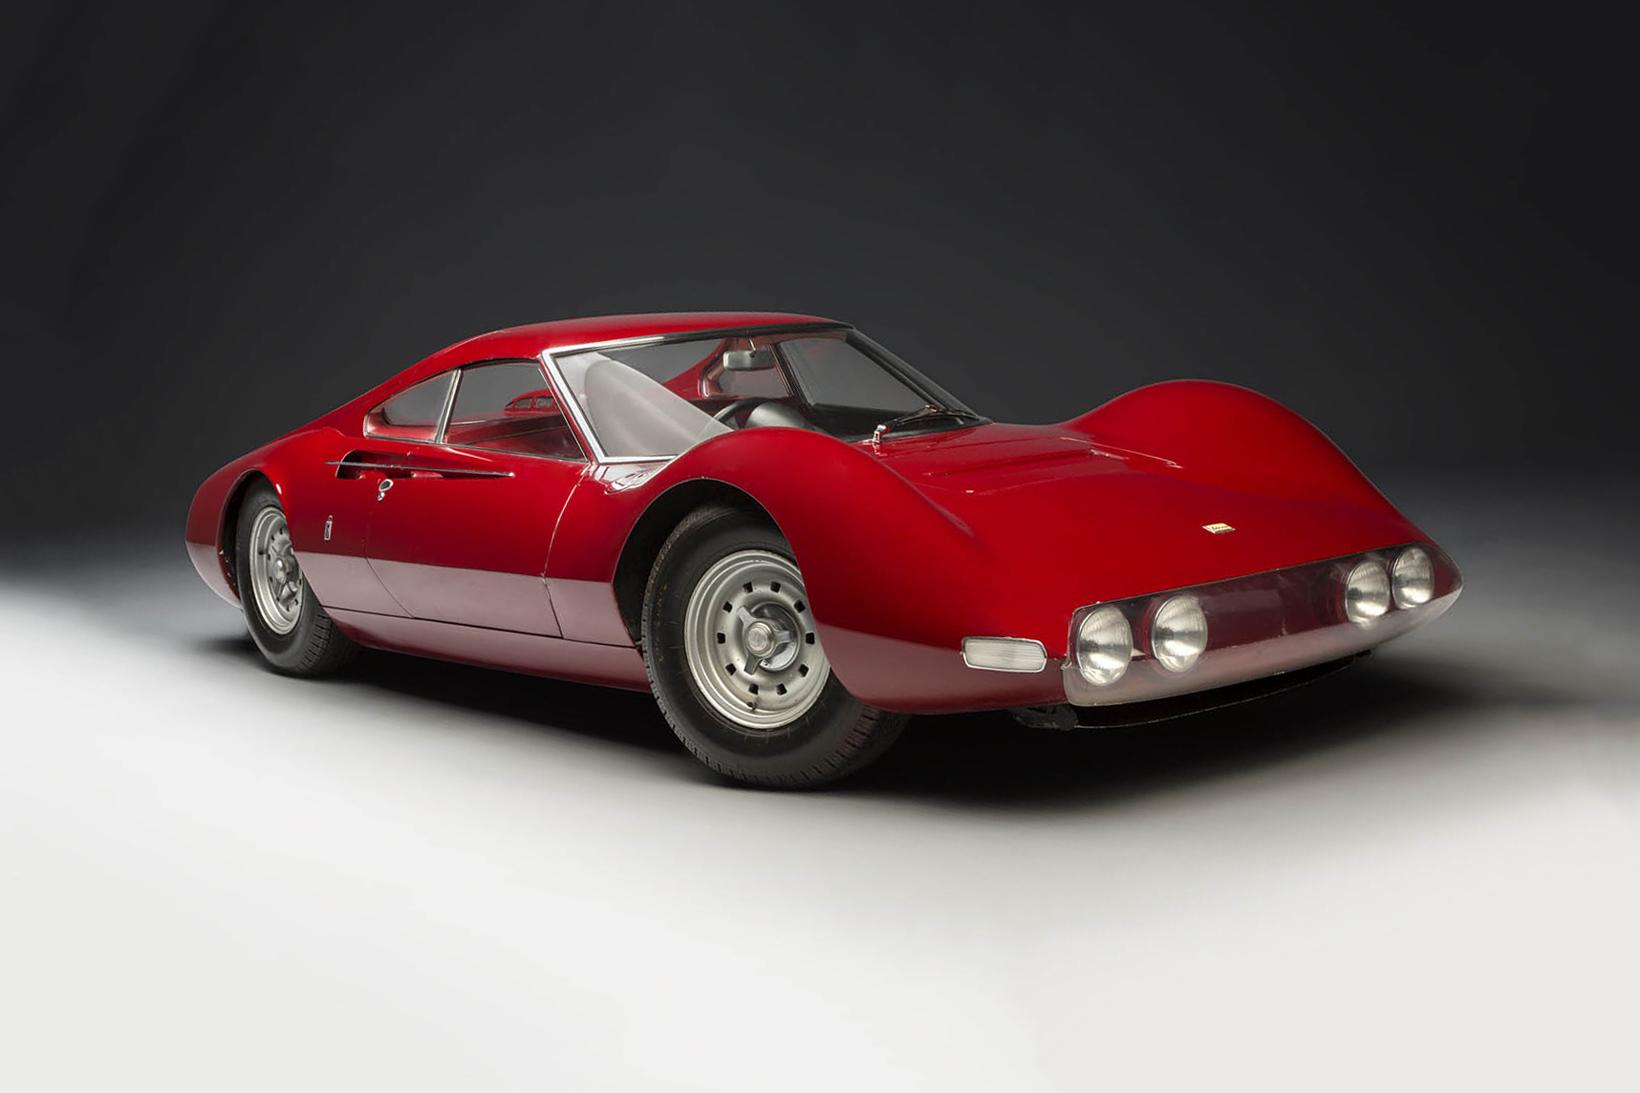 Ferrari Dino 206 Prototype Berlinetta Speciale